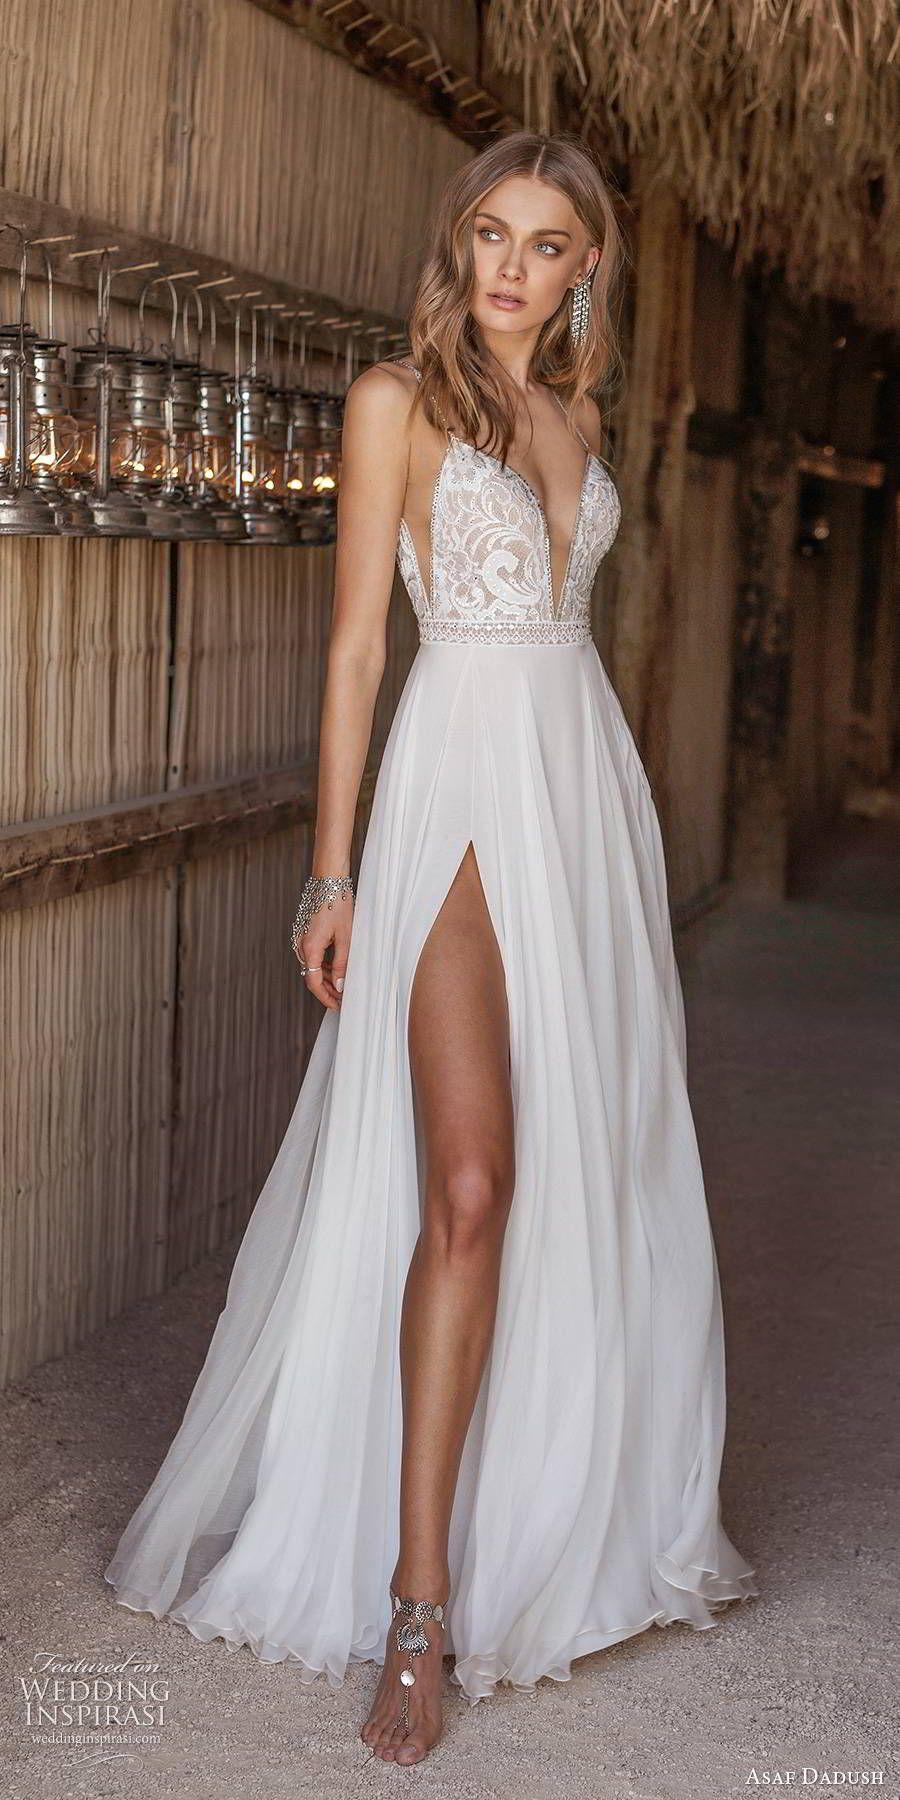 Photo of Asaf Dadush 2019 Wedding Dresses | Wedding Inspirasi